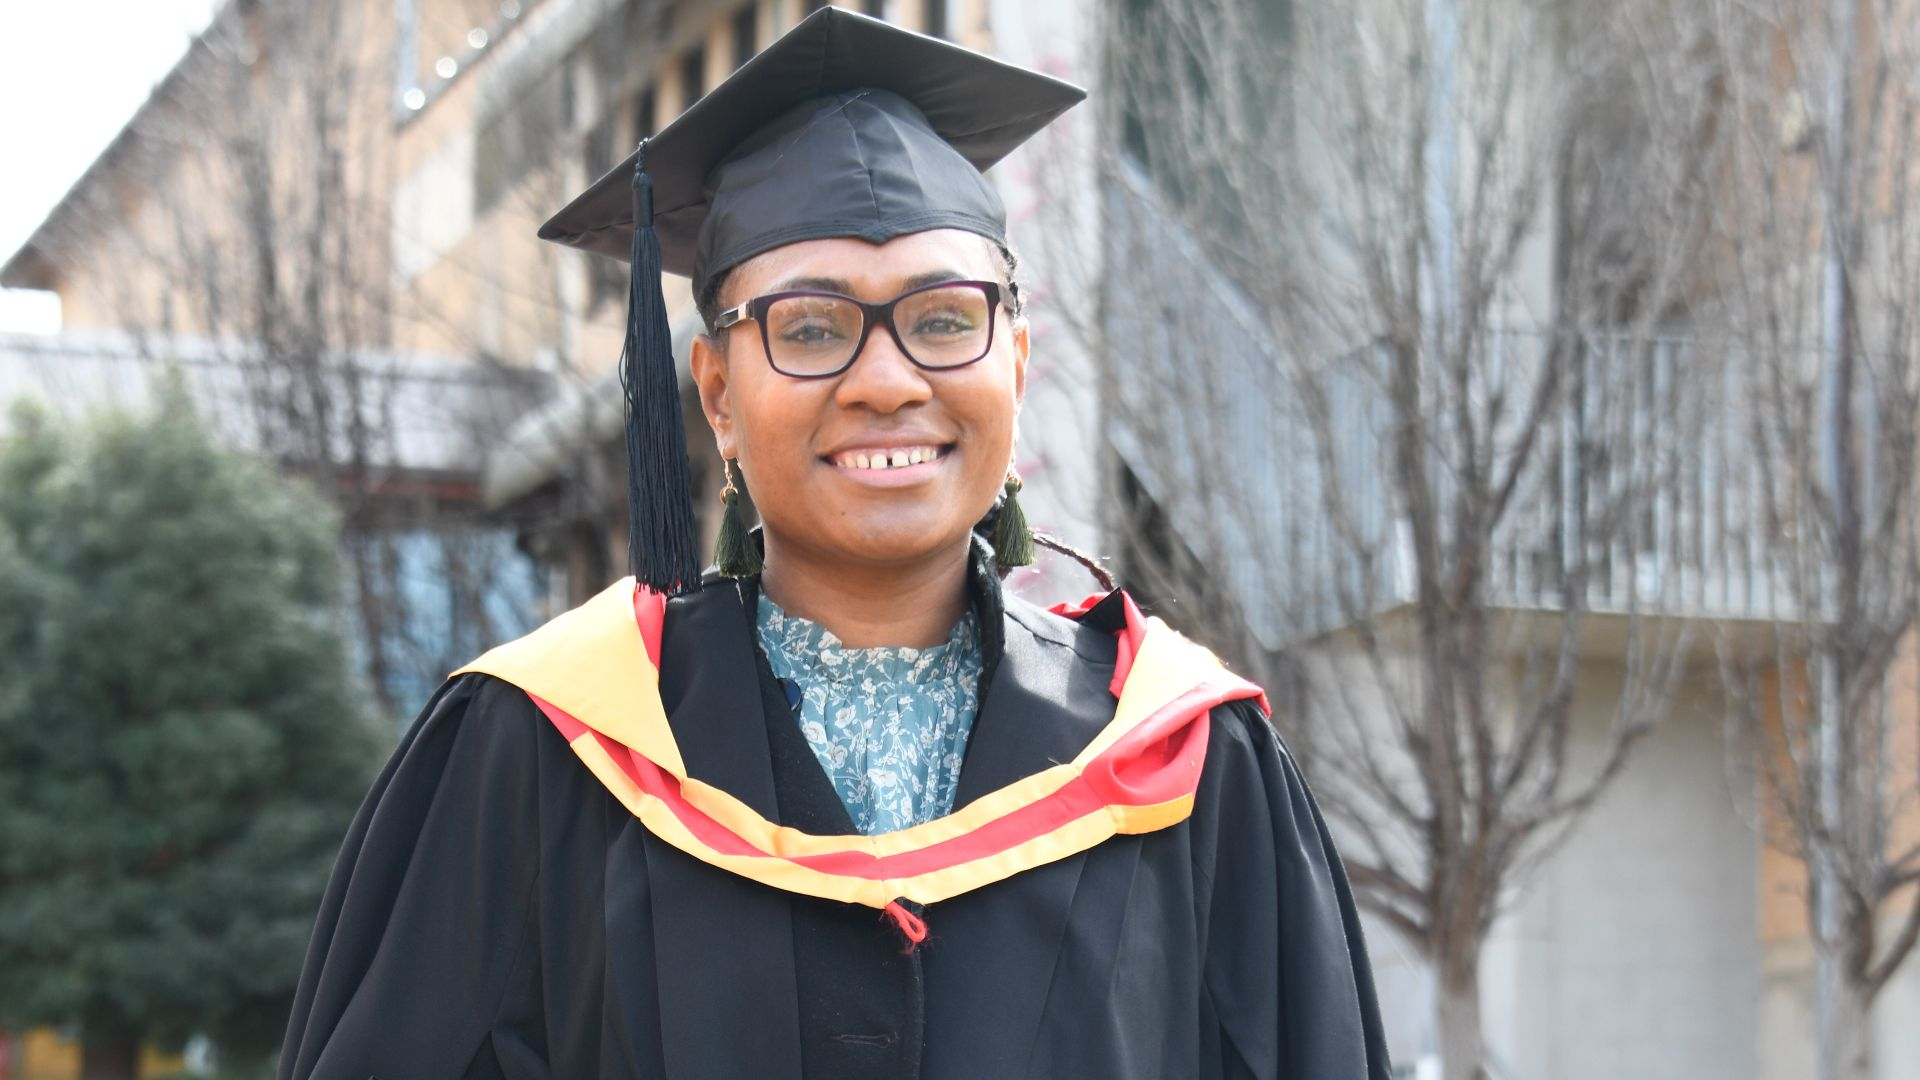 Charles Sturt graduate to become first female vet in Papua New Guinea